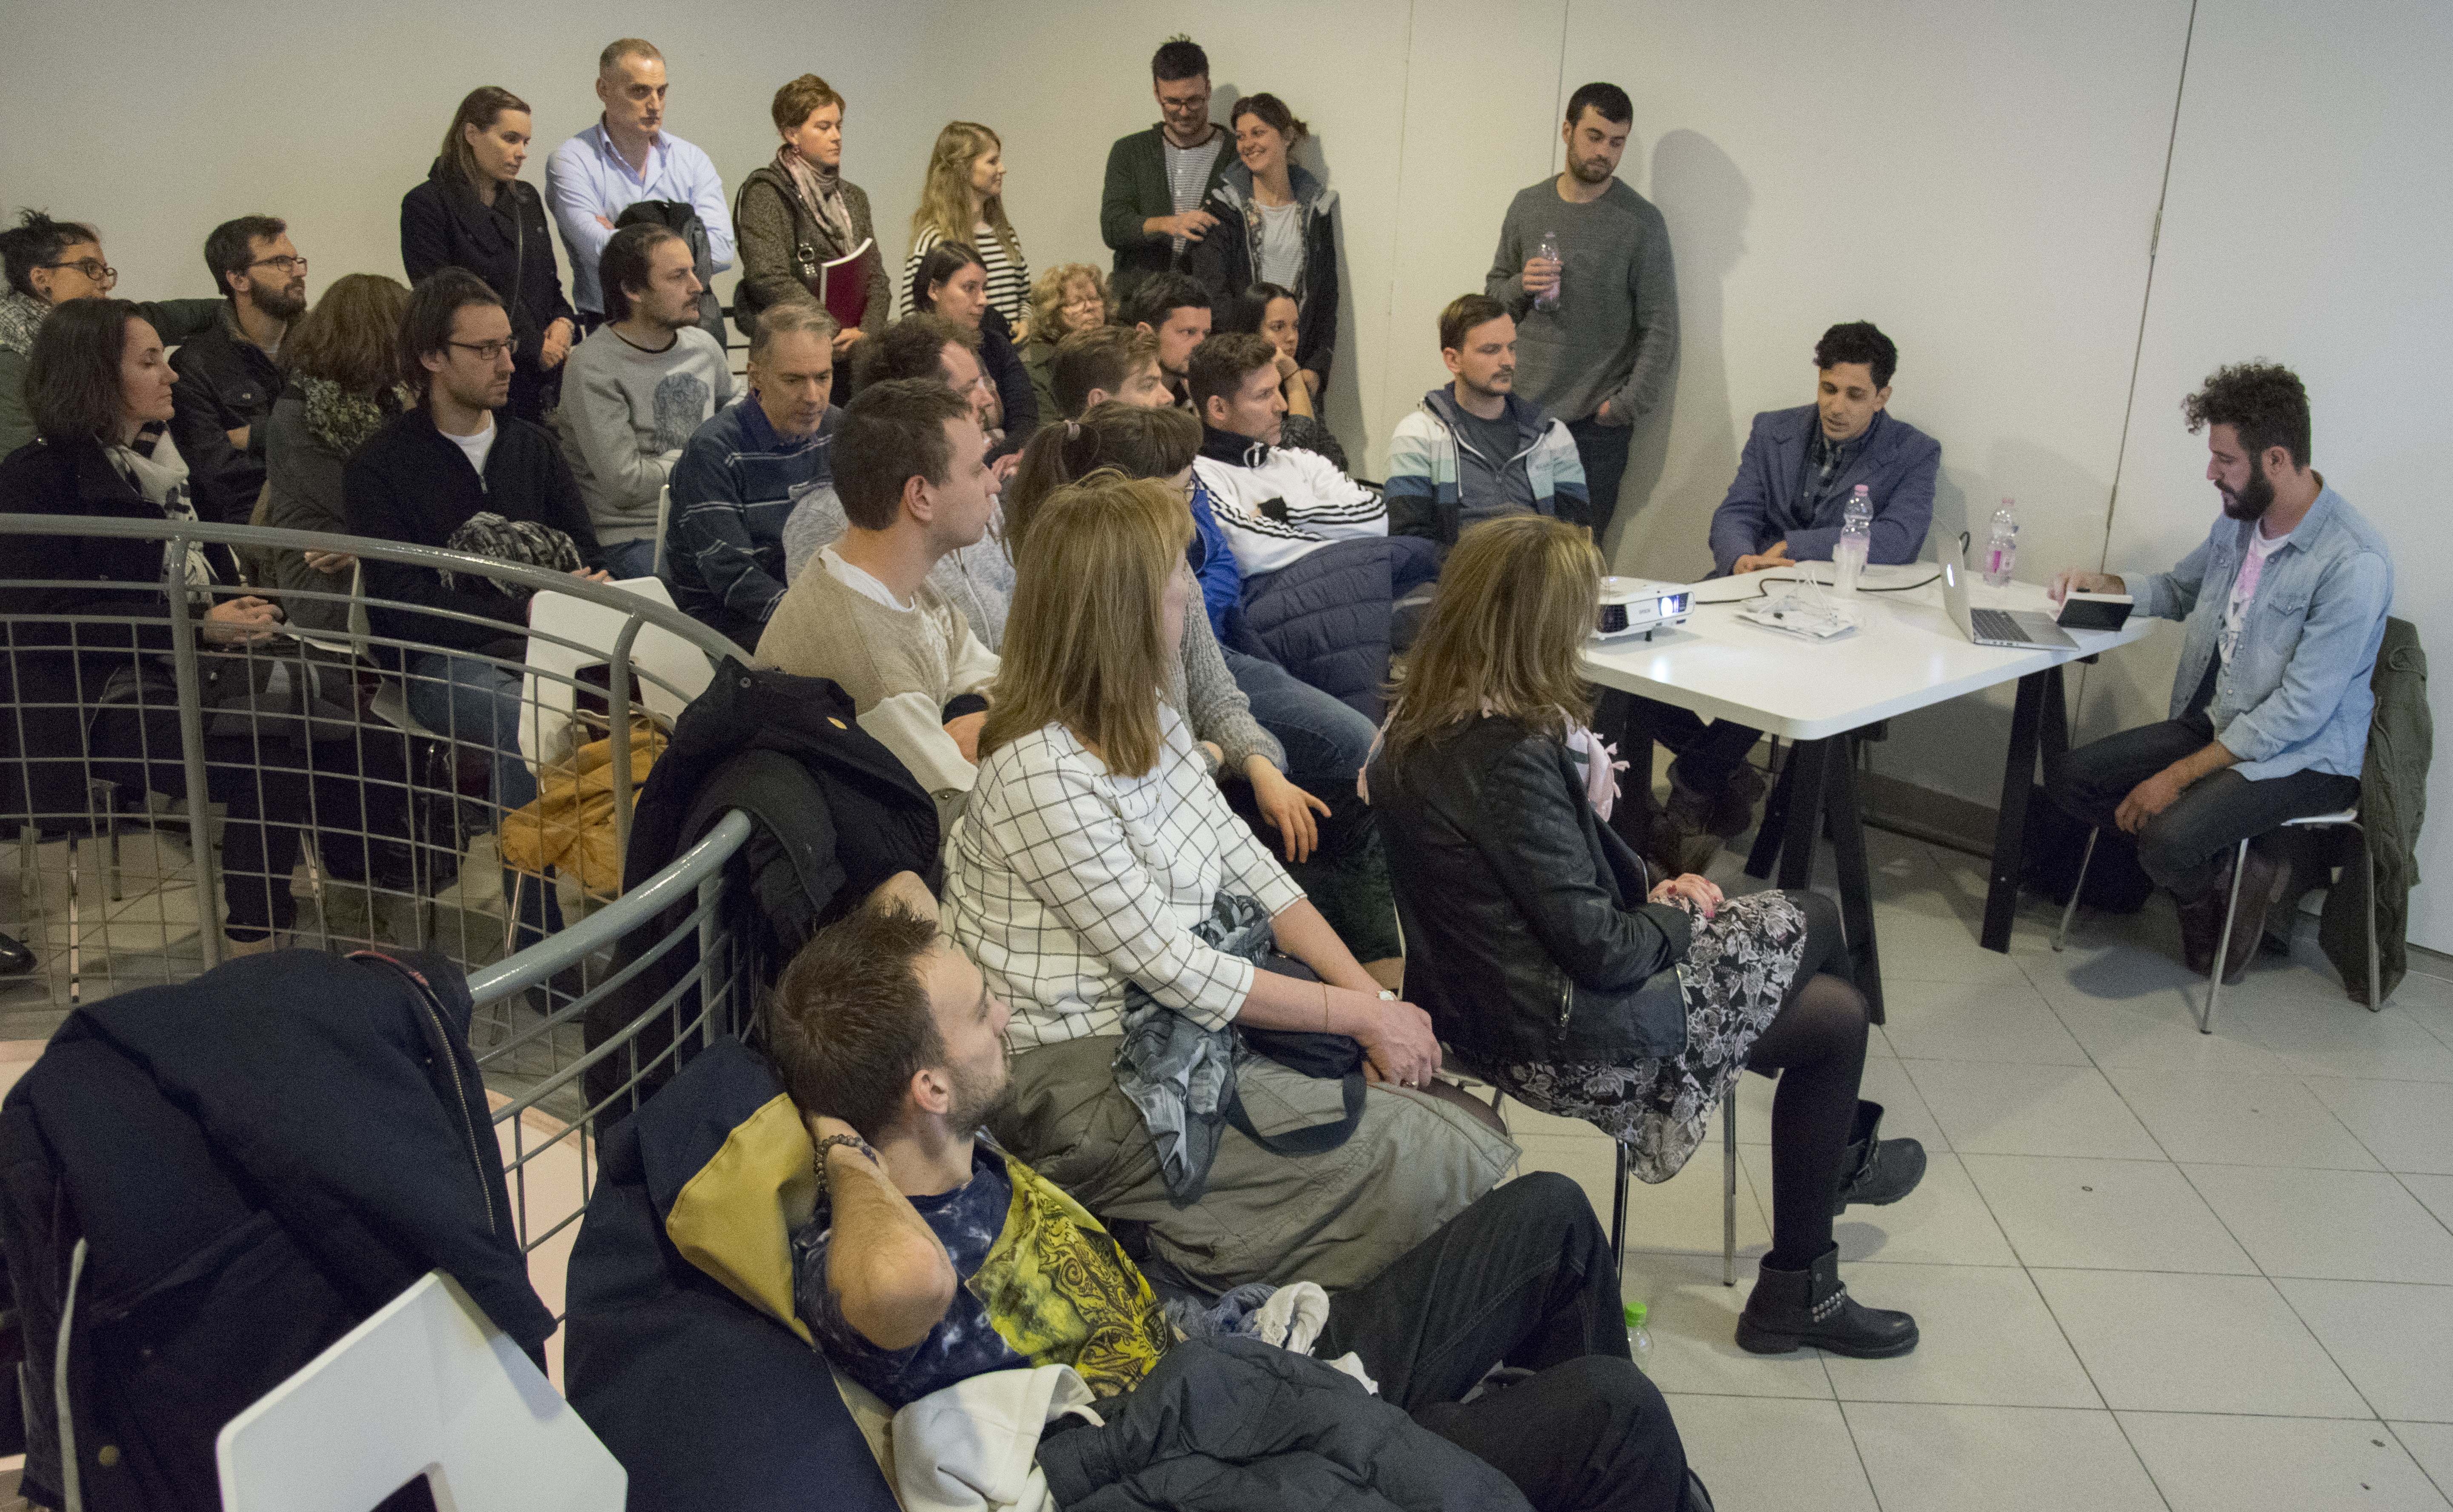 Contemporary Inspiration – Raúl Moreno's lecture at the Festivalcenter